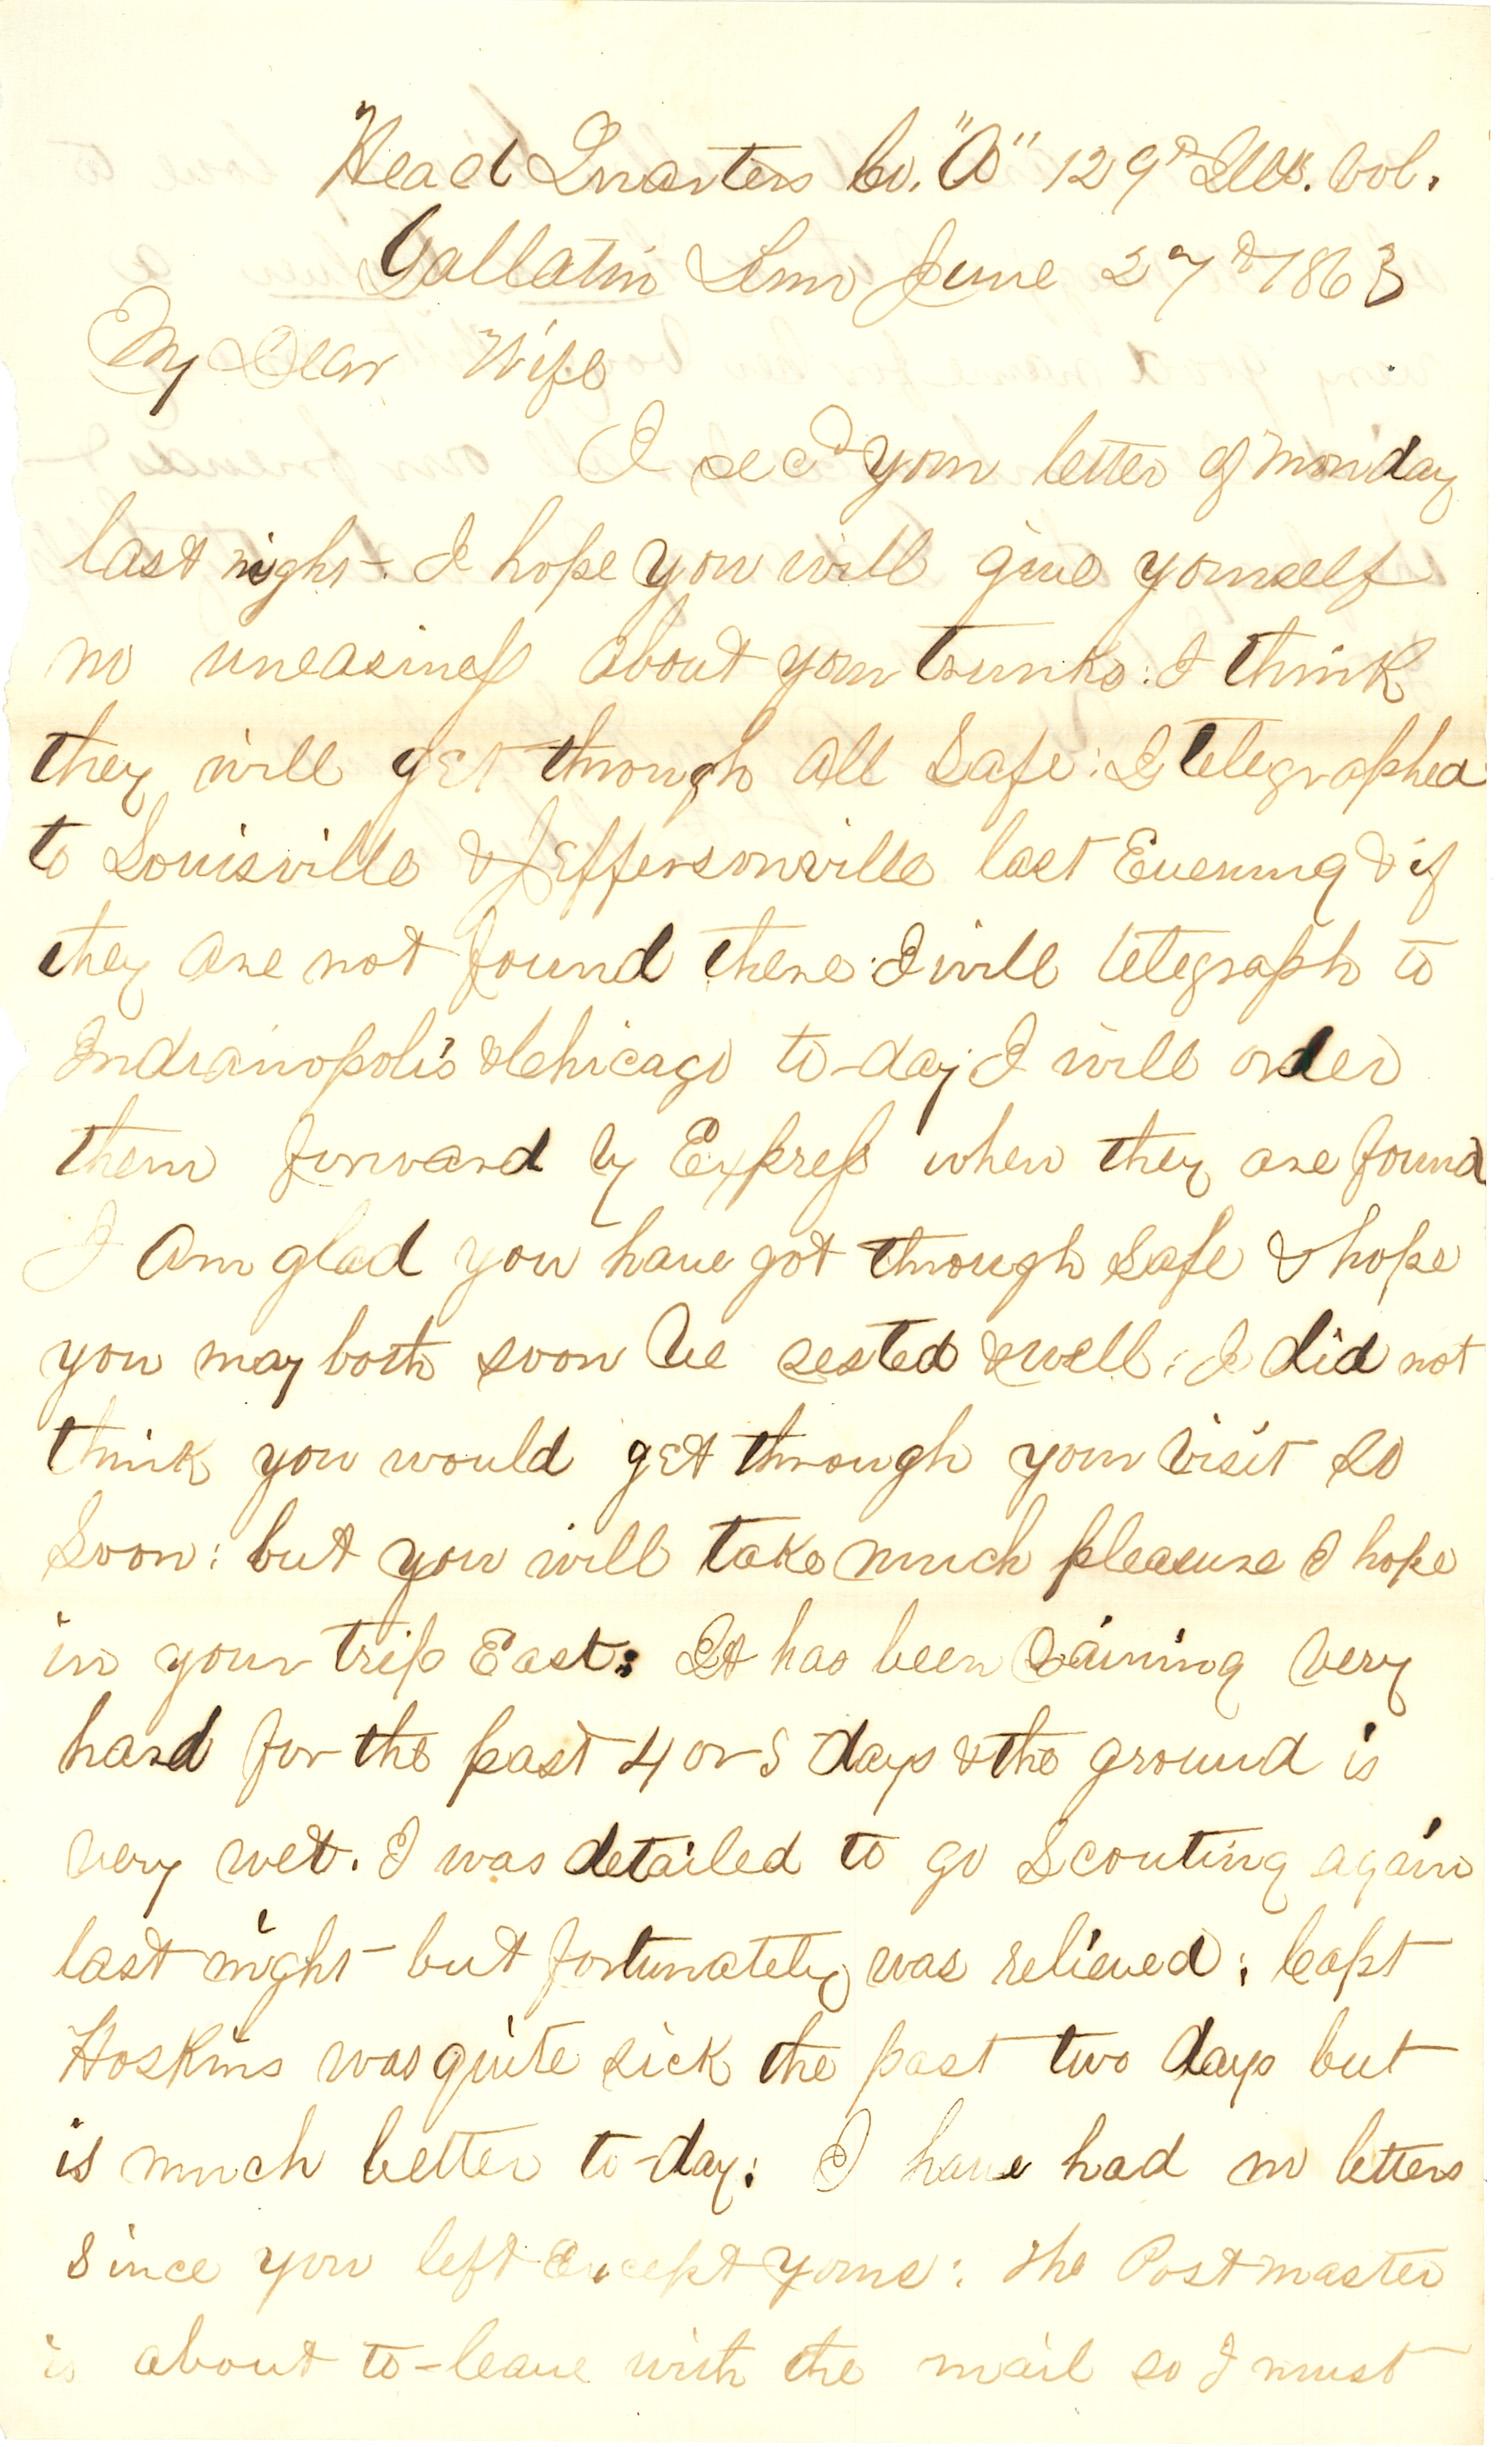 Joseph Culver Letter, June 27, 1863, Page 1